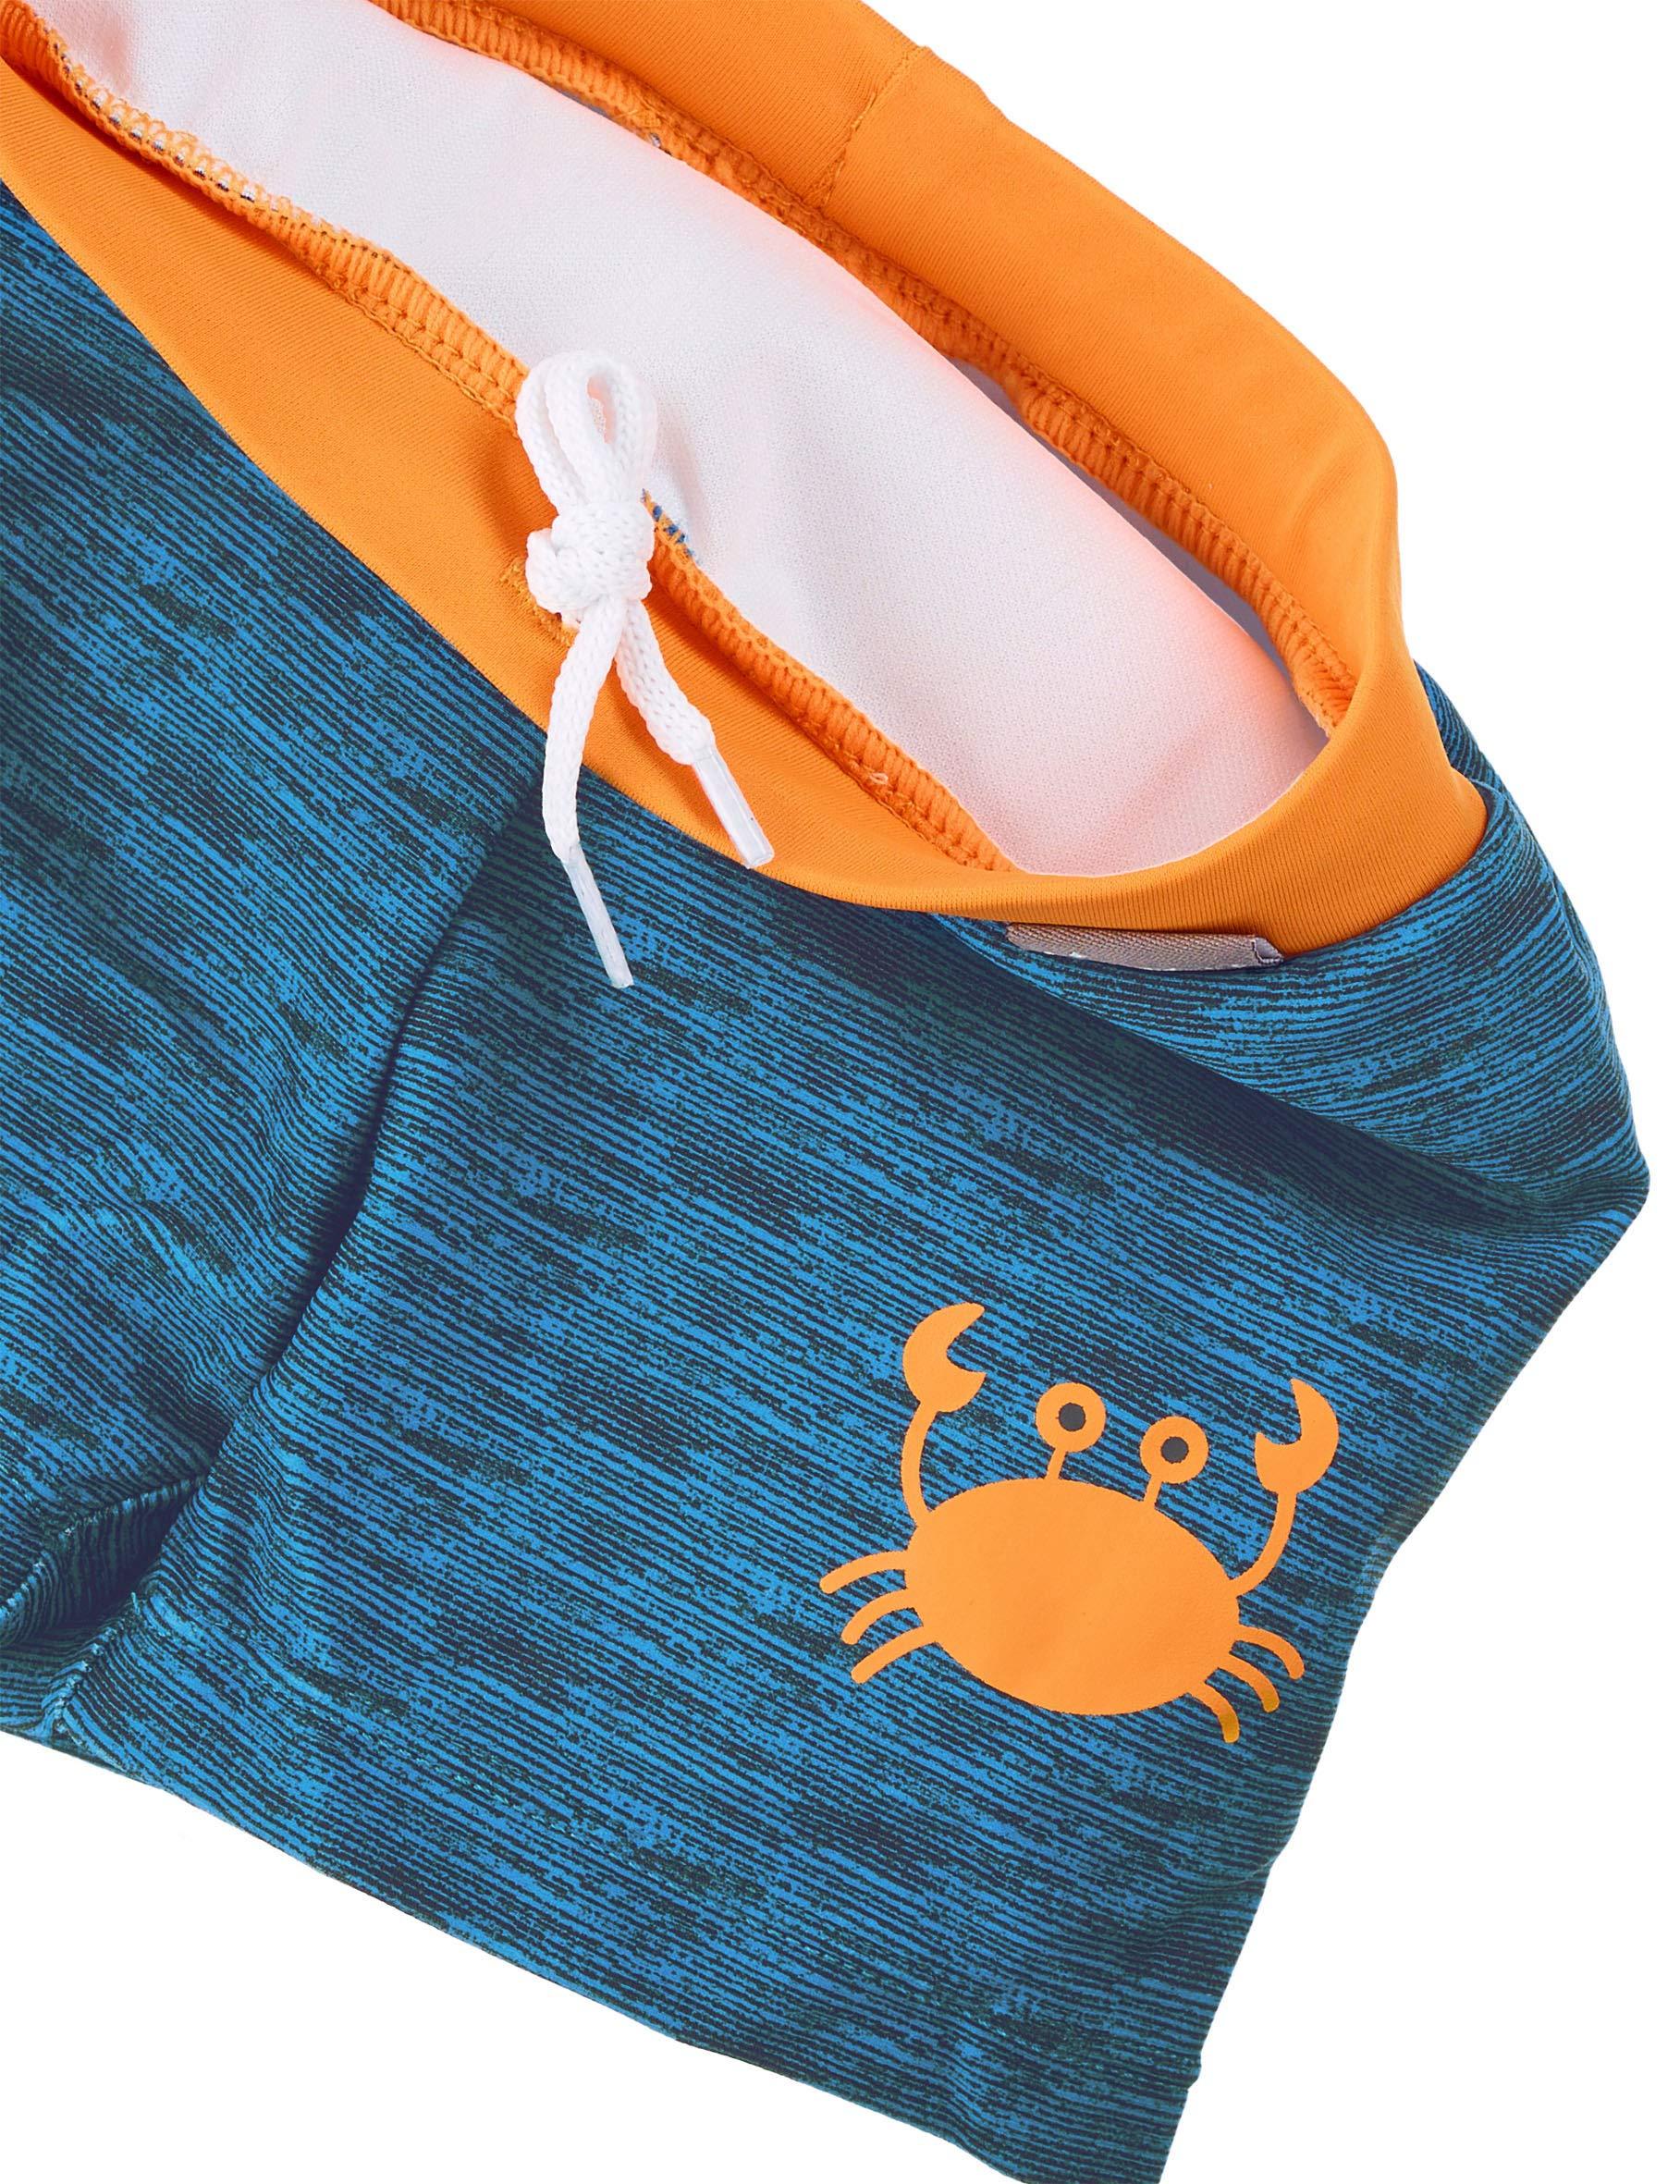 Sterntaler Badeshort Pantalones Cortos para Bebés 3